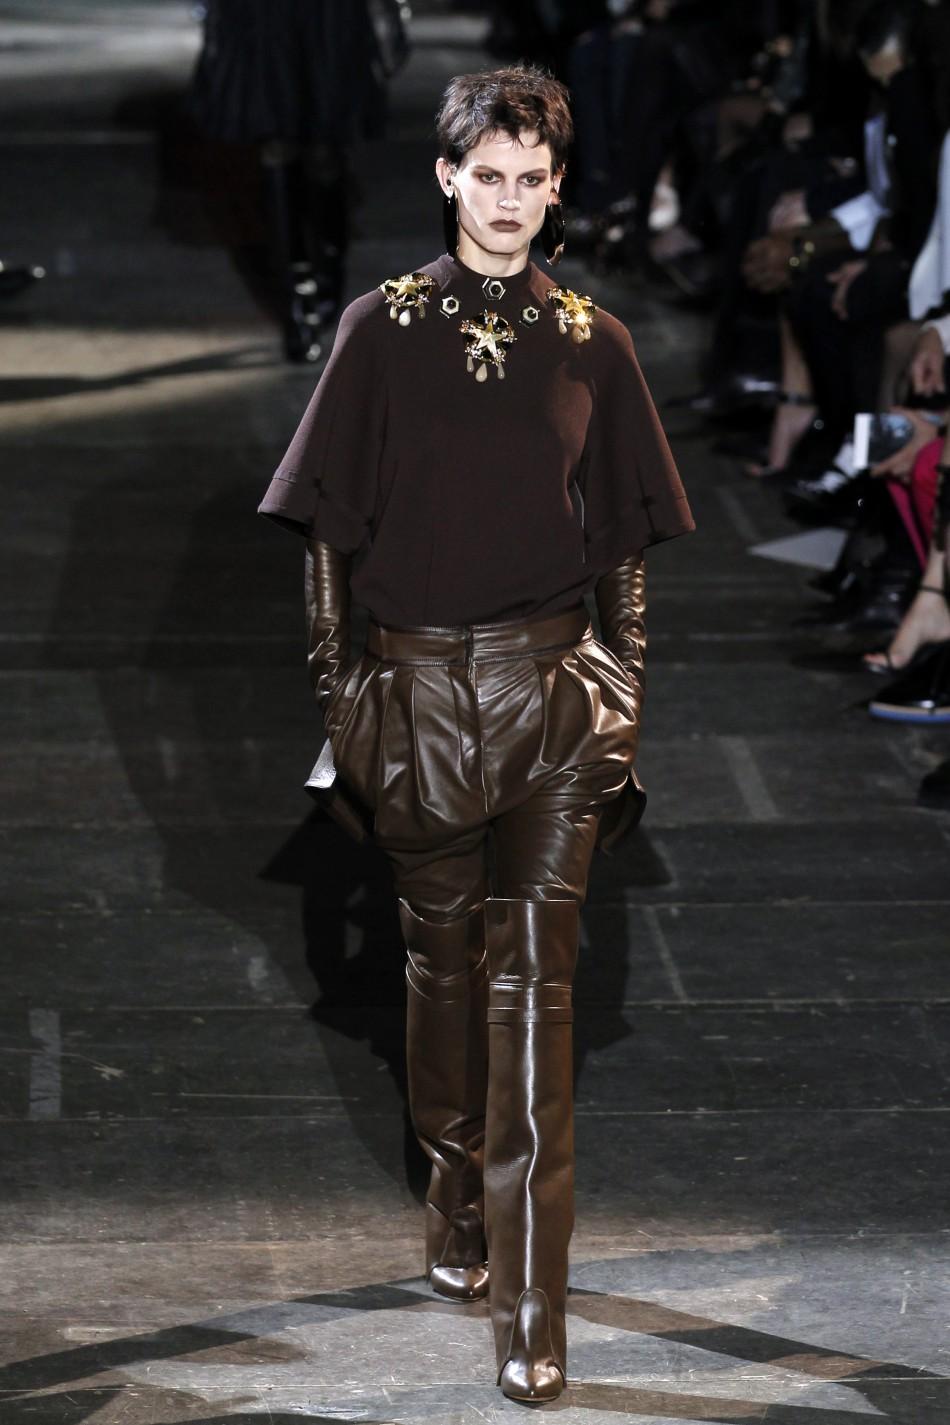 Paris Fashion Week: Riccardo Tisci for Givenchy [SLIDESHOW]